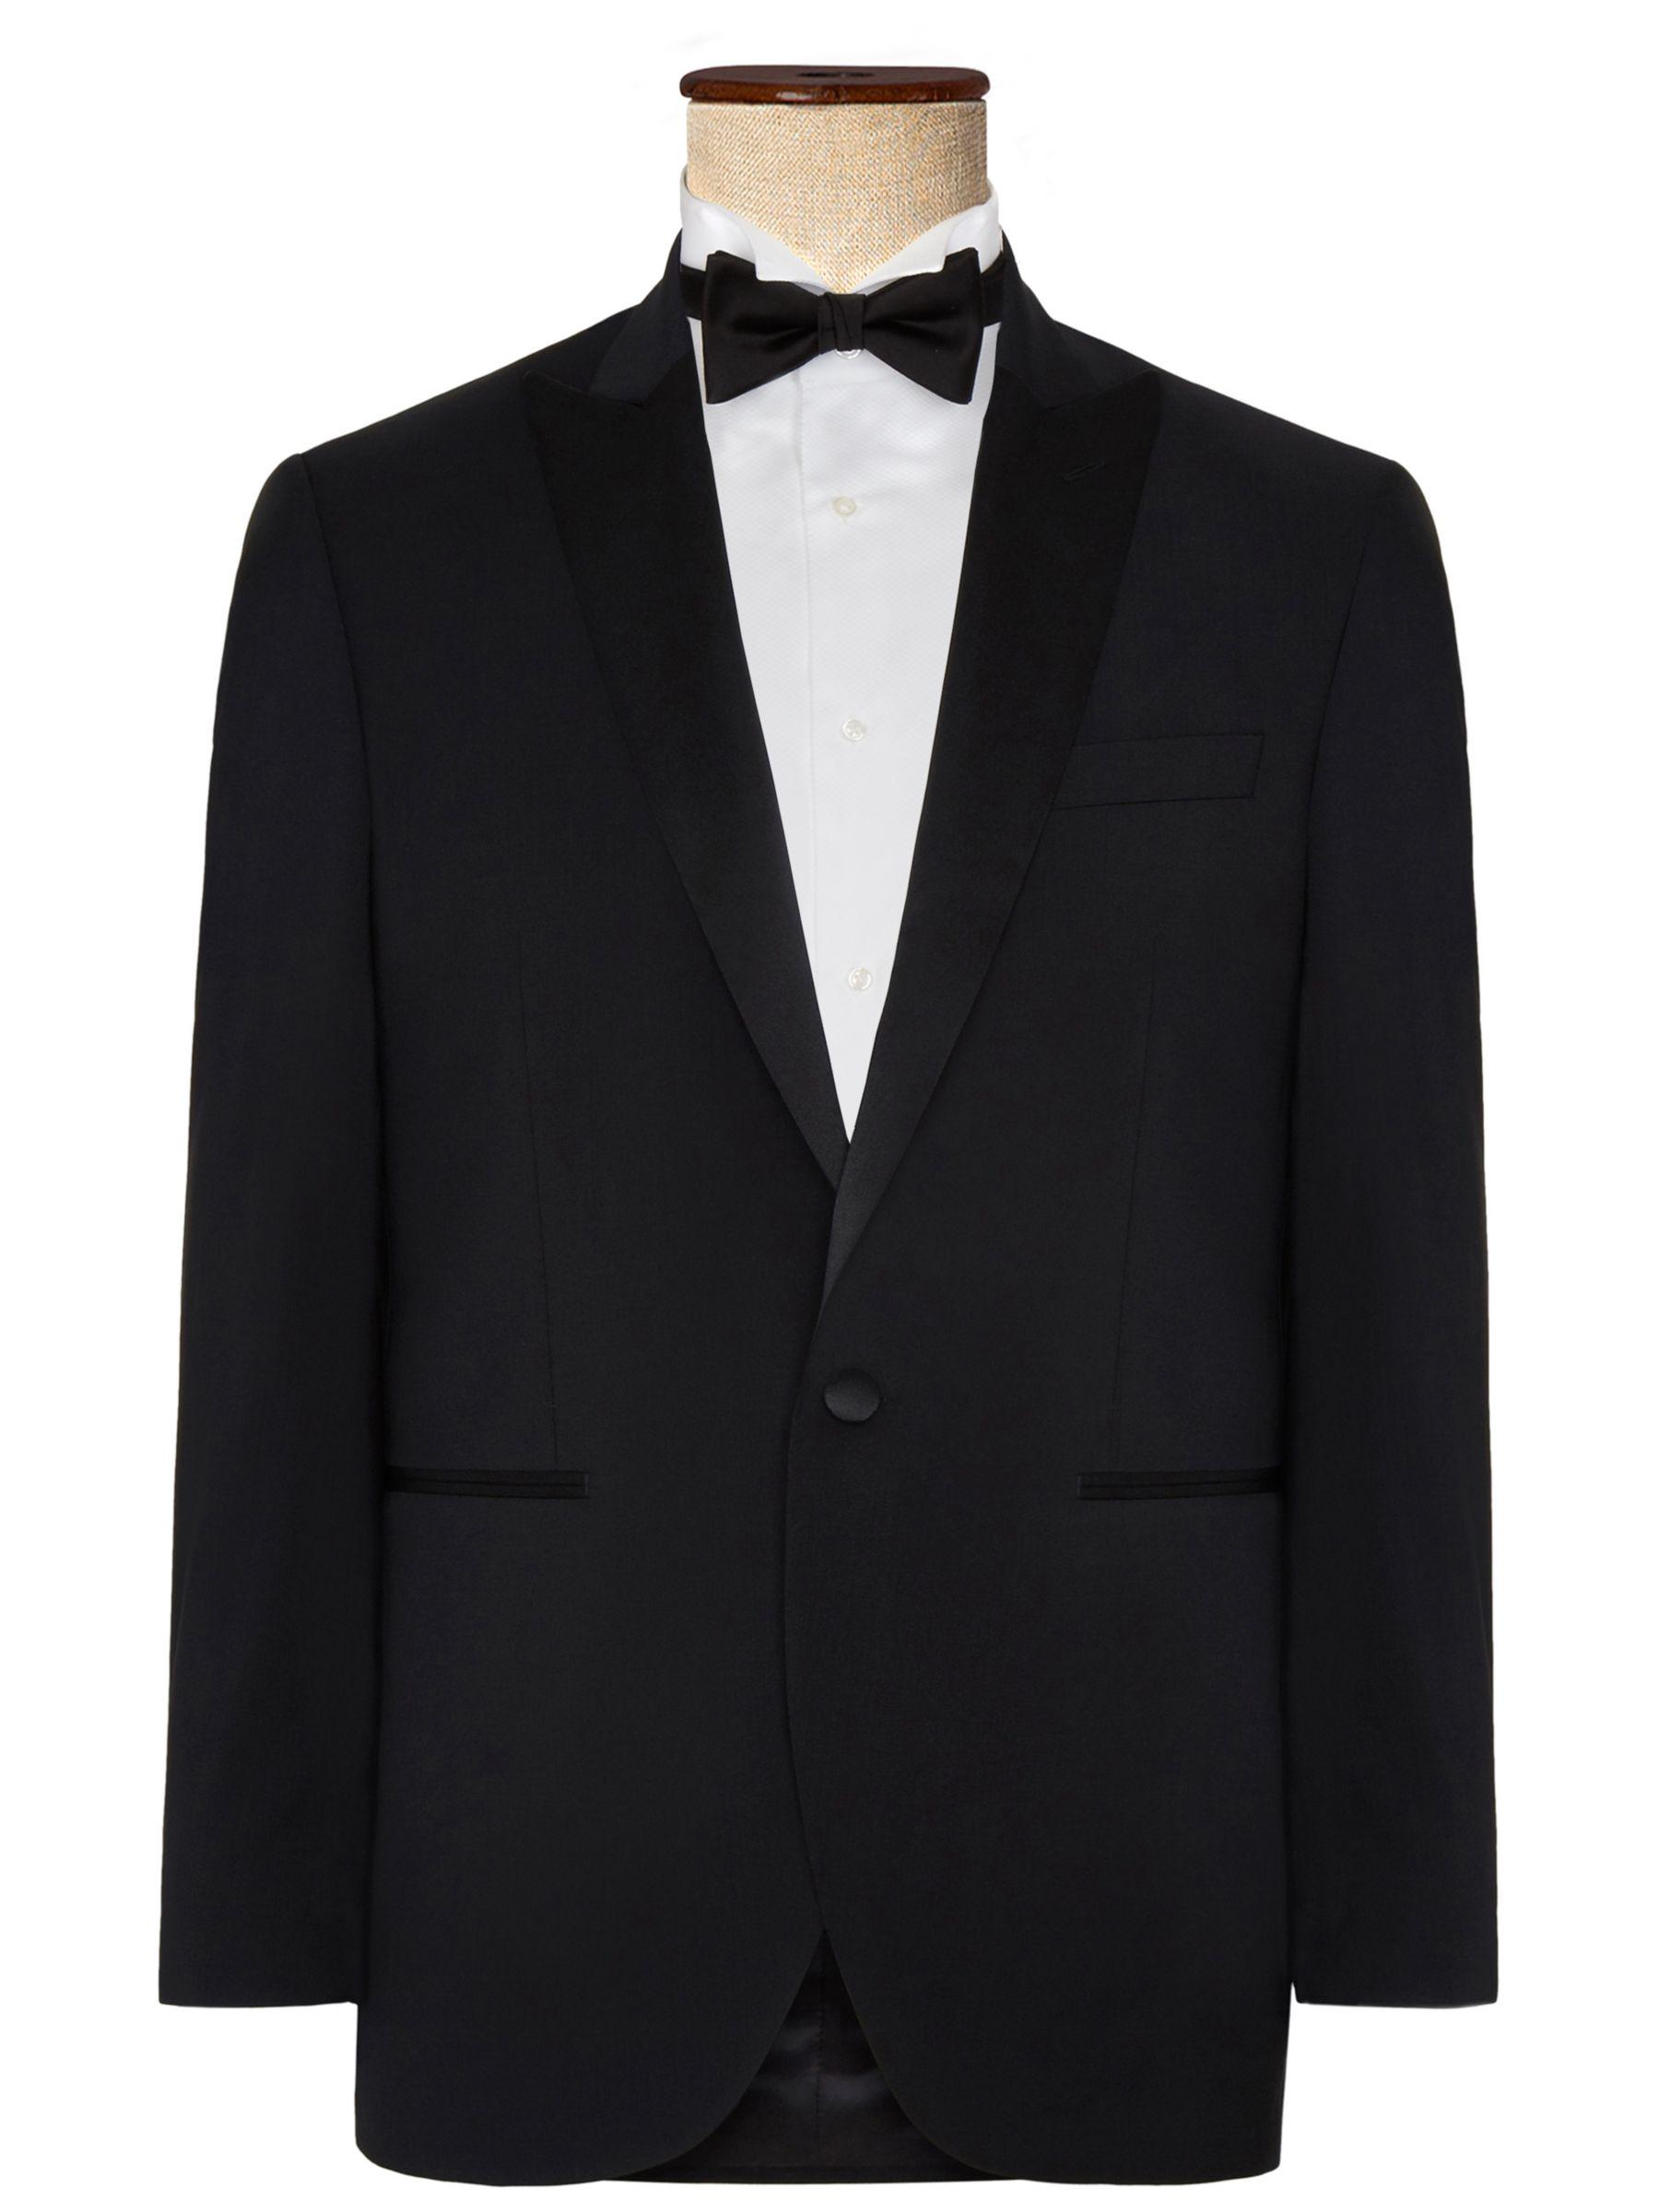 Hackett London Hackett London Regular Fit Dress Suit Jacket, Black